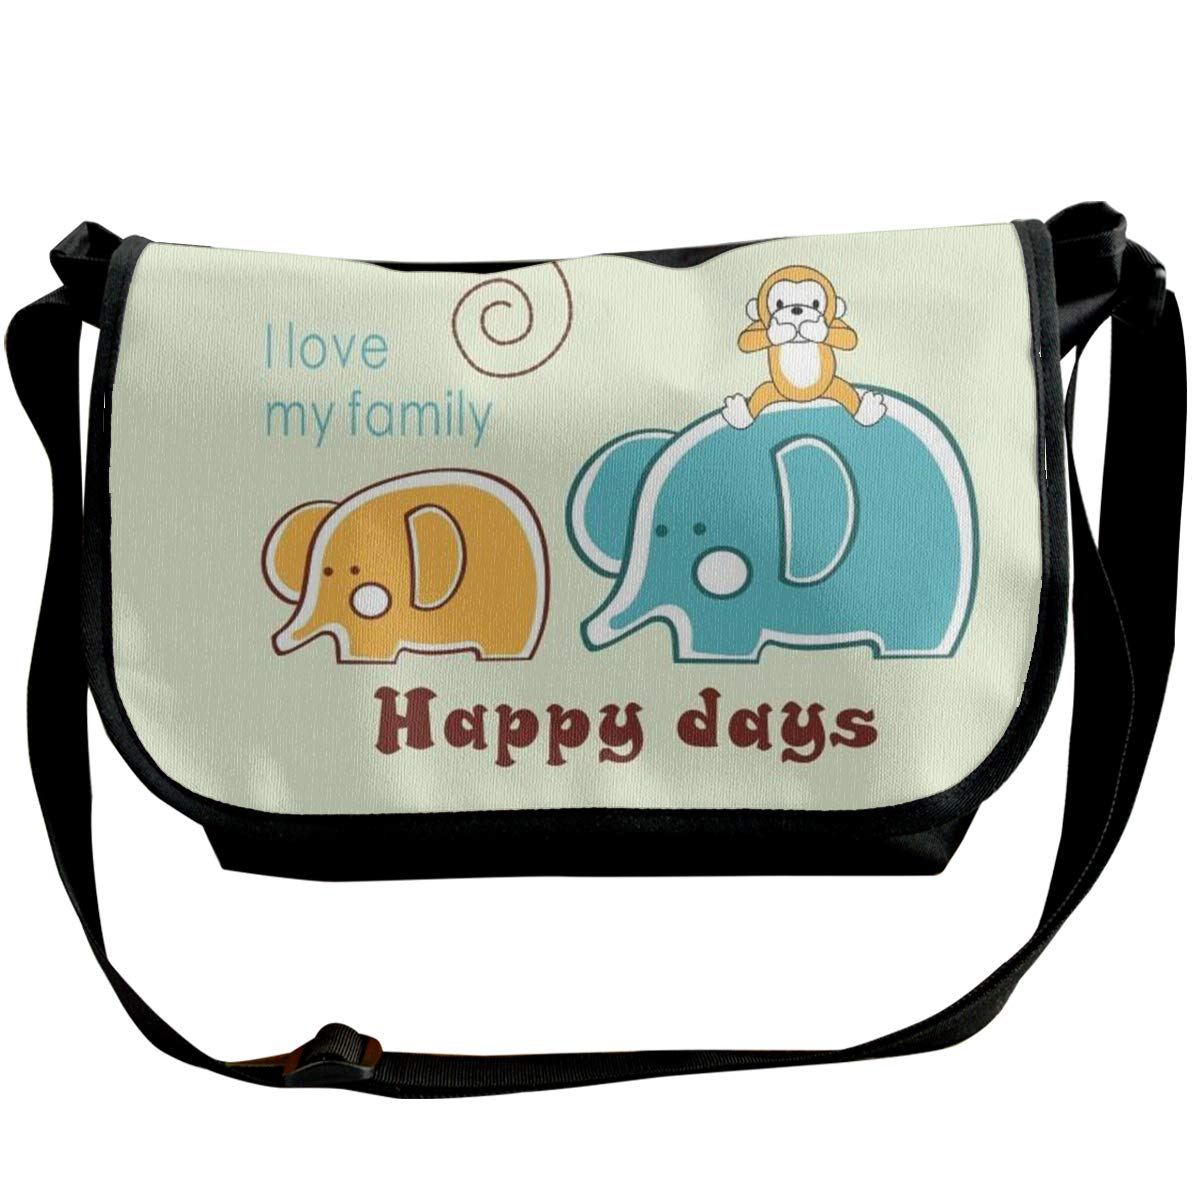 XIANGXIANG SHOP Happy Elephant Family Fashion Unisex Casual Popular Outdoor Sling Bag Messenger Bag Shoulder Bag